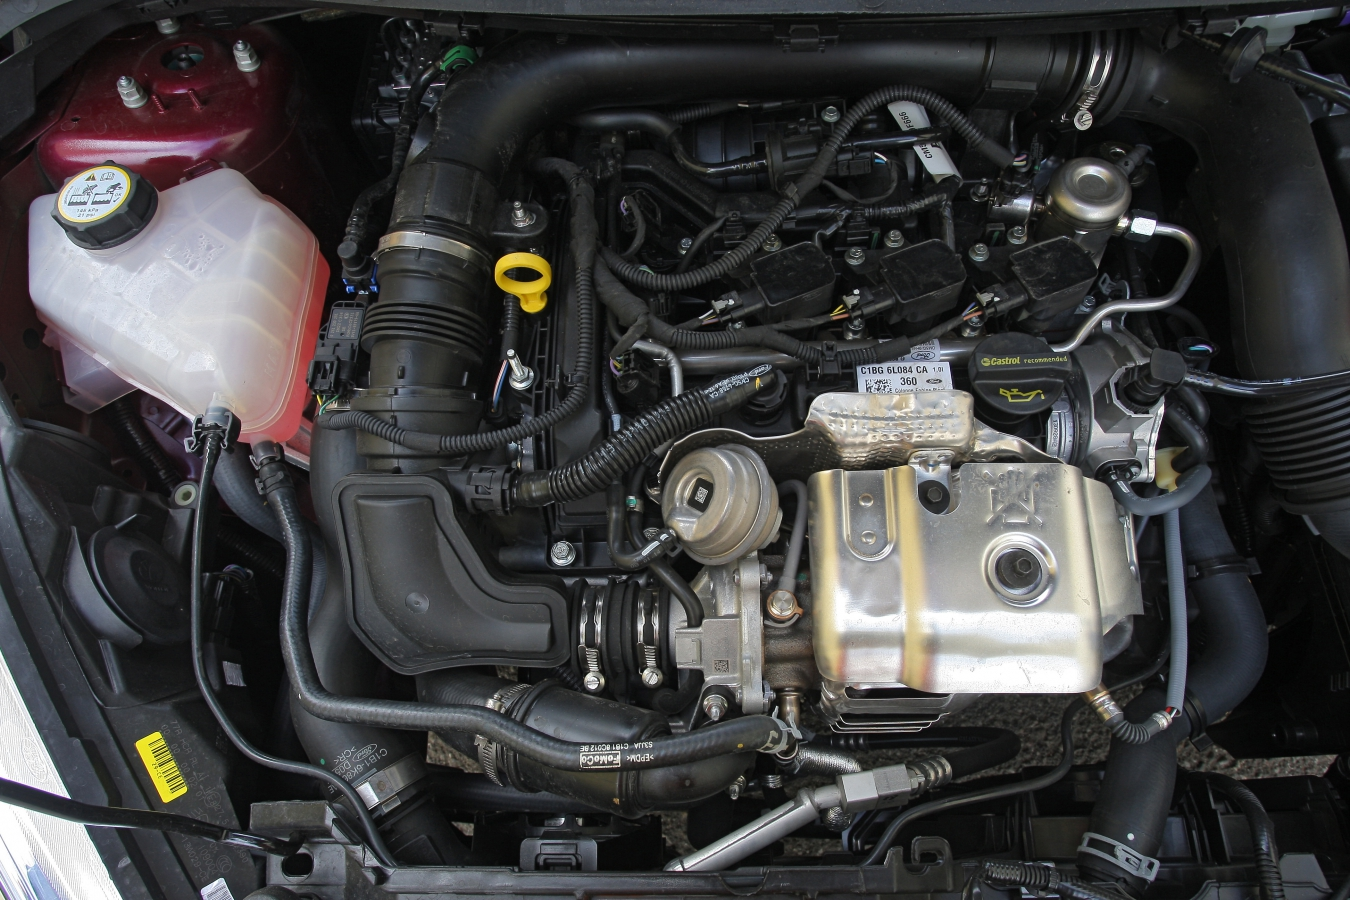 Ford Fiesta 1.0 EcoBoost motor